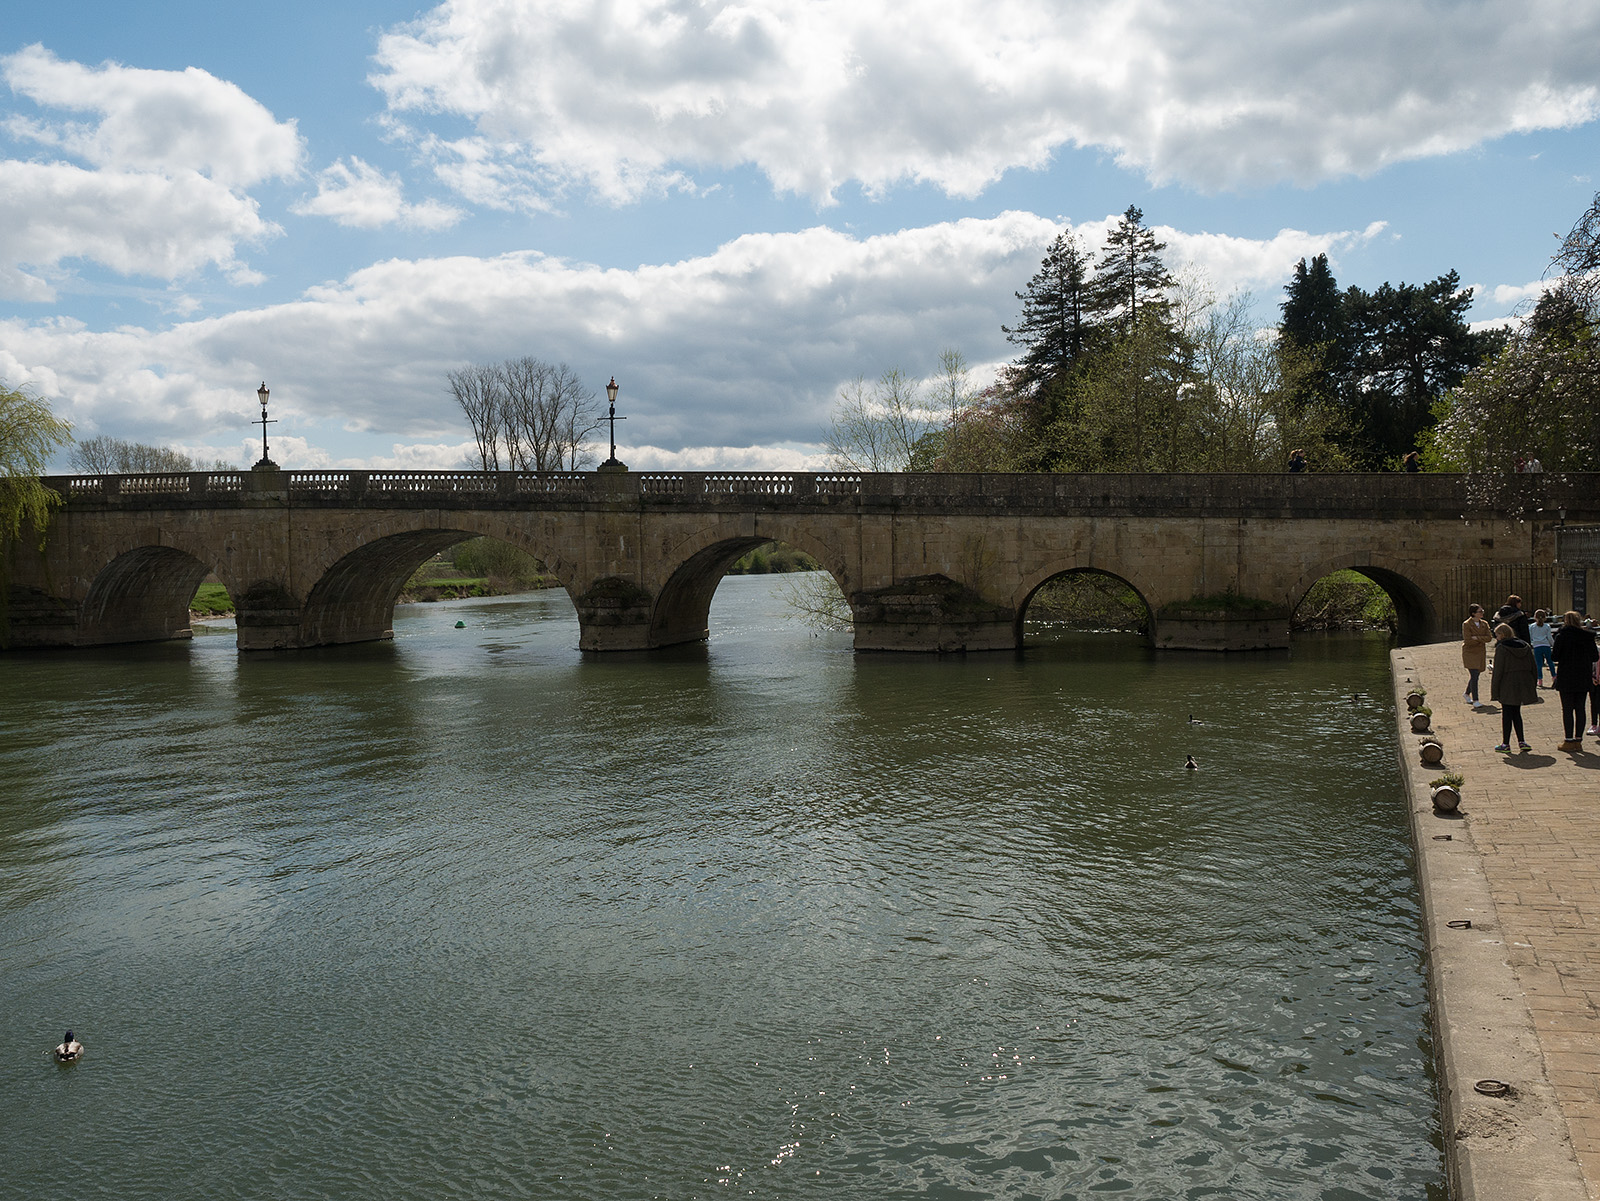 Wallingford bridge (looking back).